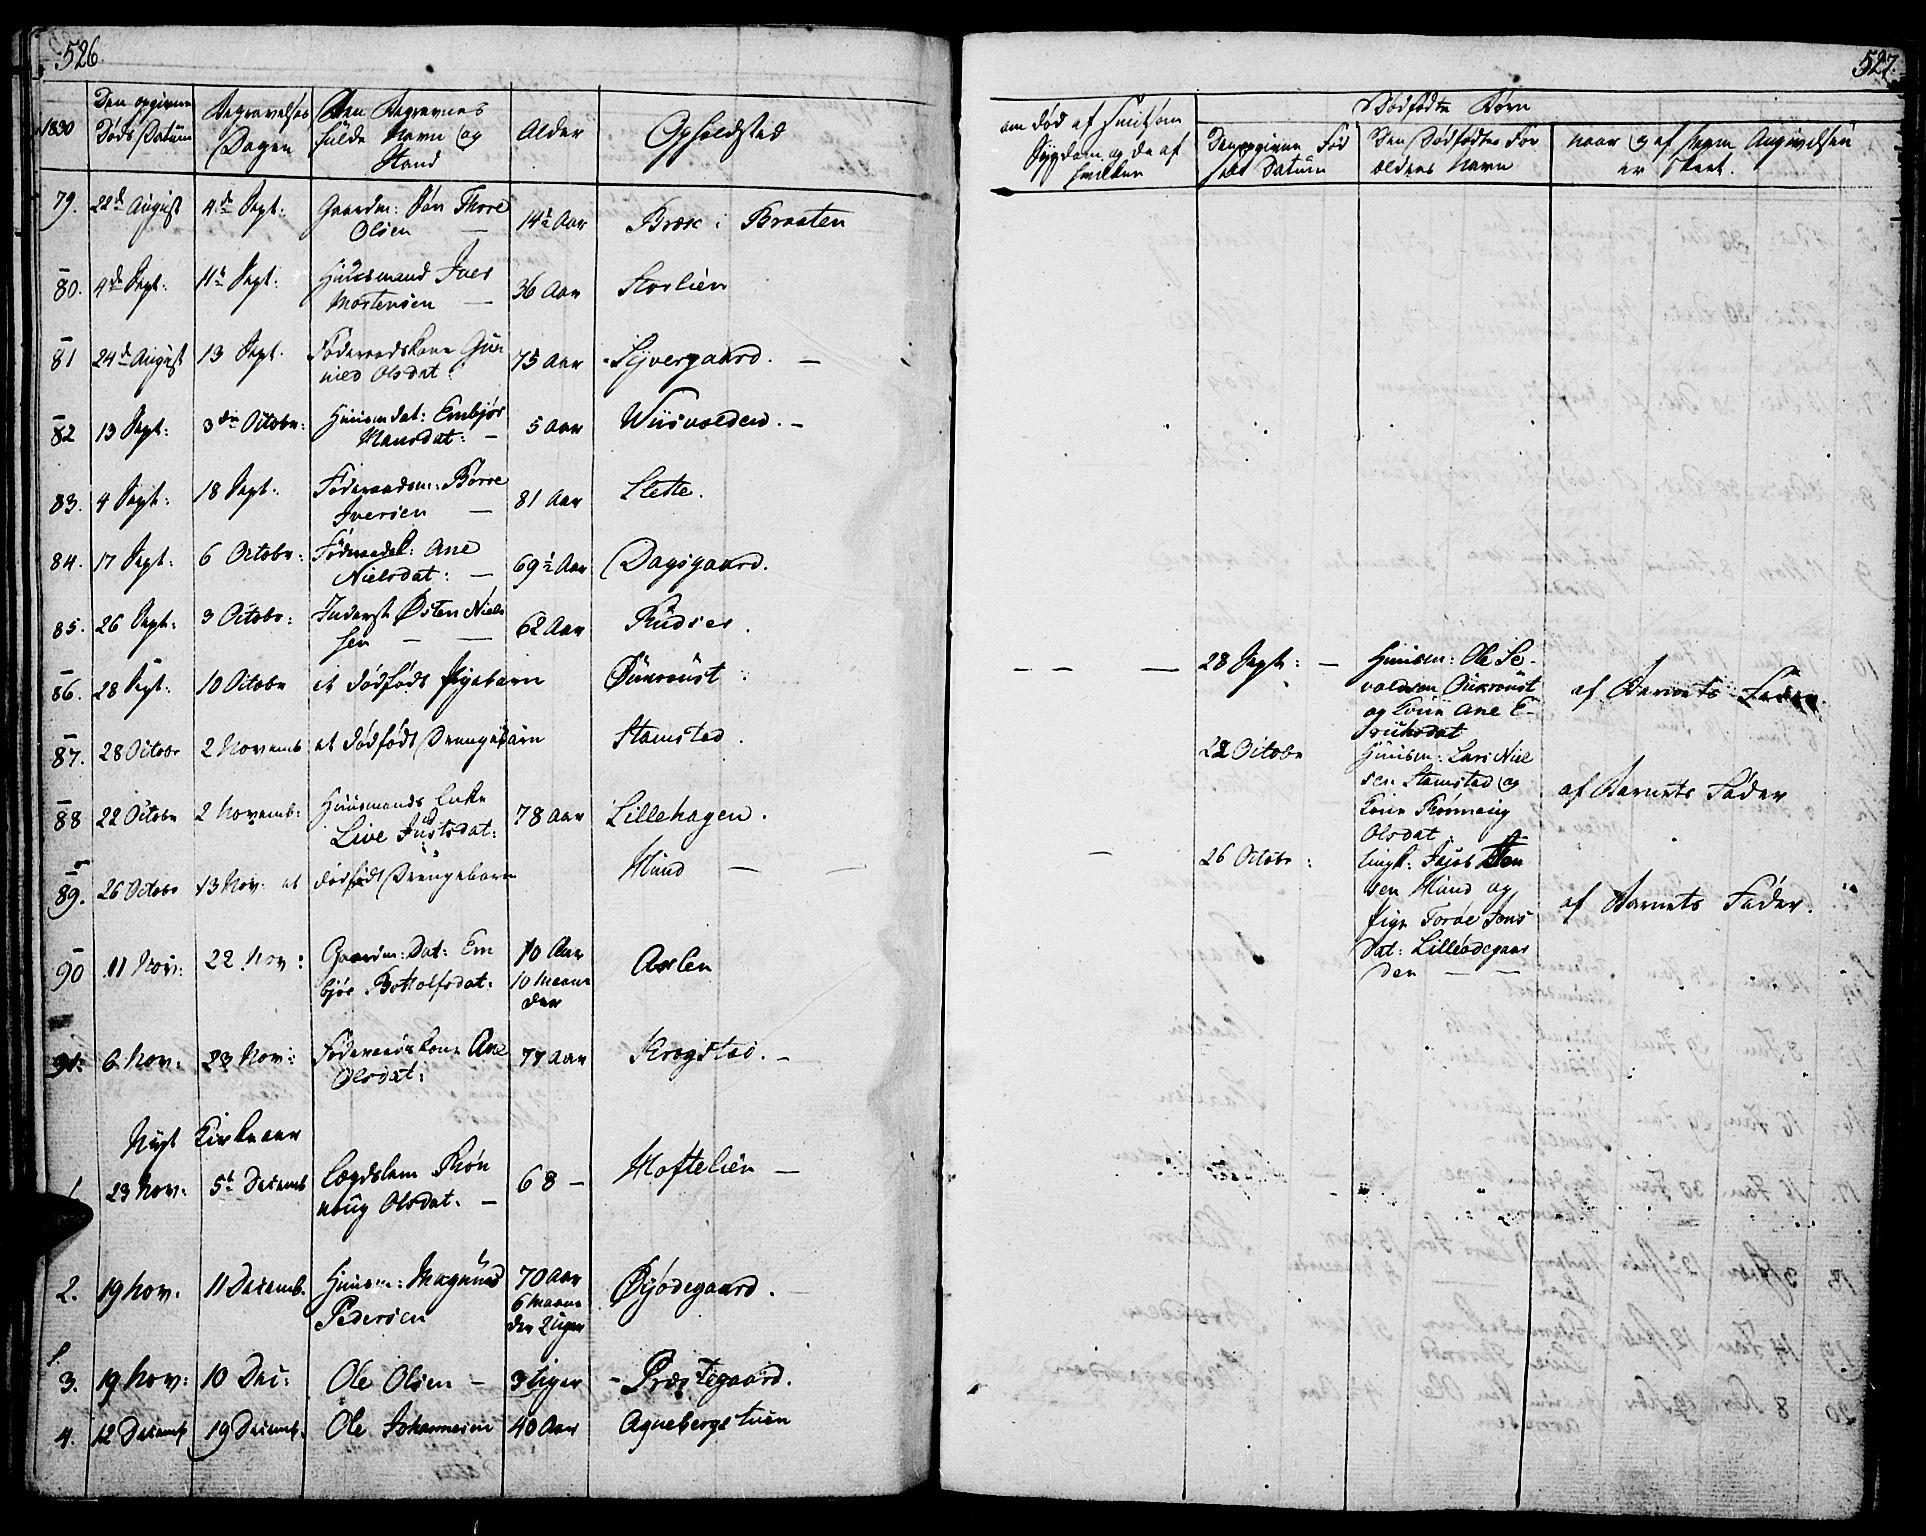 SAH, Lom prestekontor, K/L0005: Parish register (official) no. 5, 1825-1837, p. 526-527